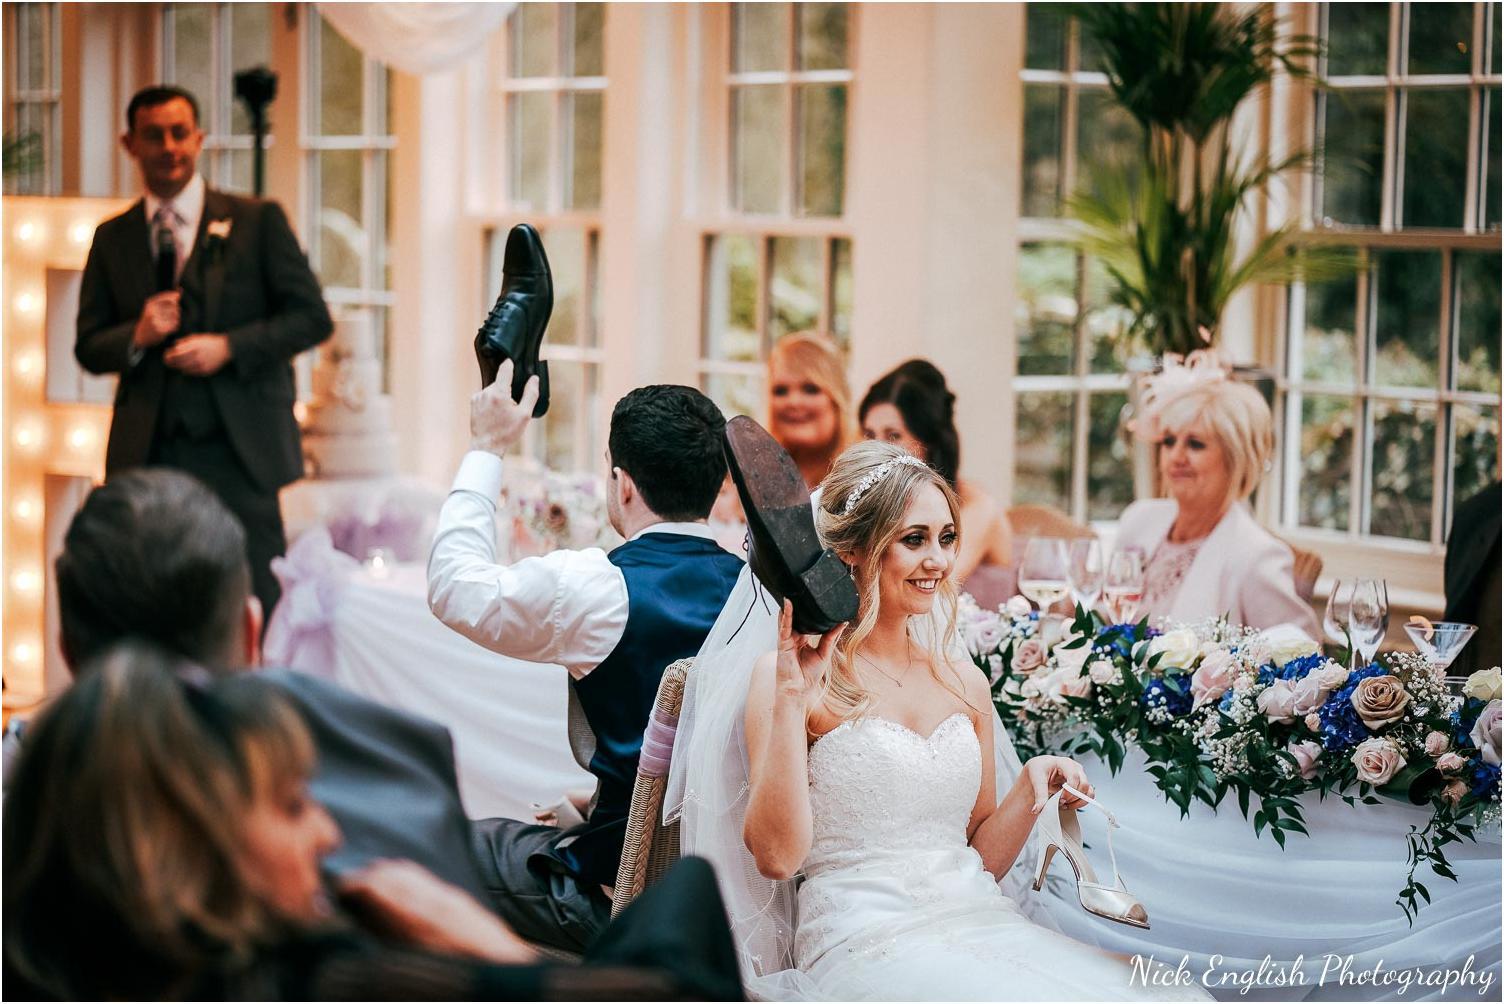 Mitton_Hall_Wedding_Photographer_2018-128.jpg